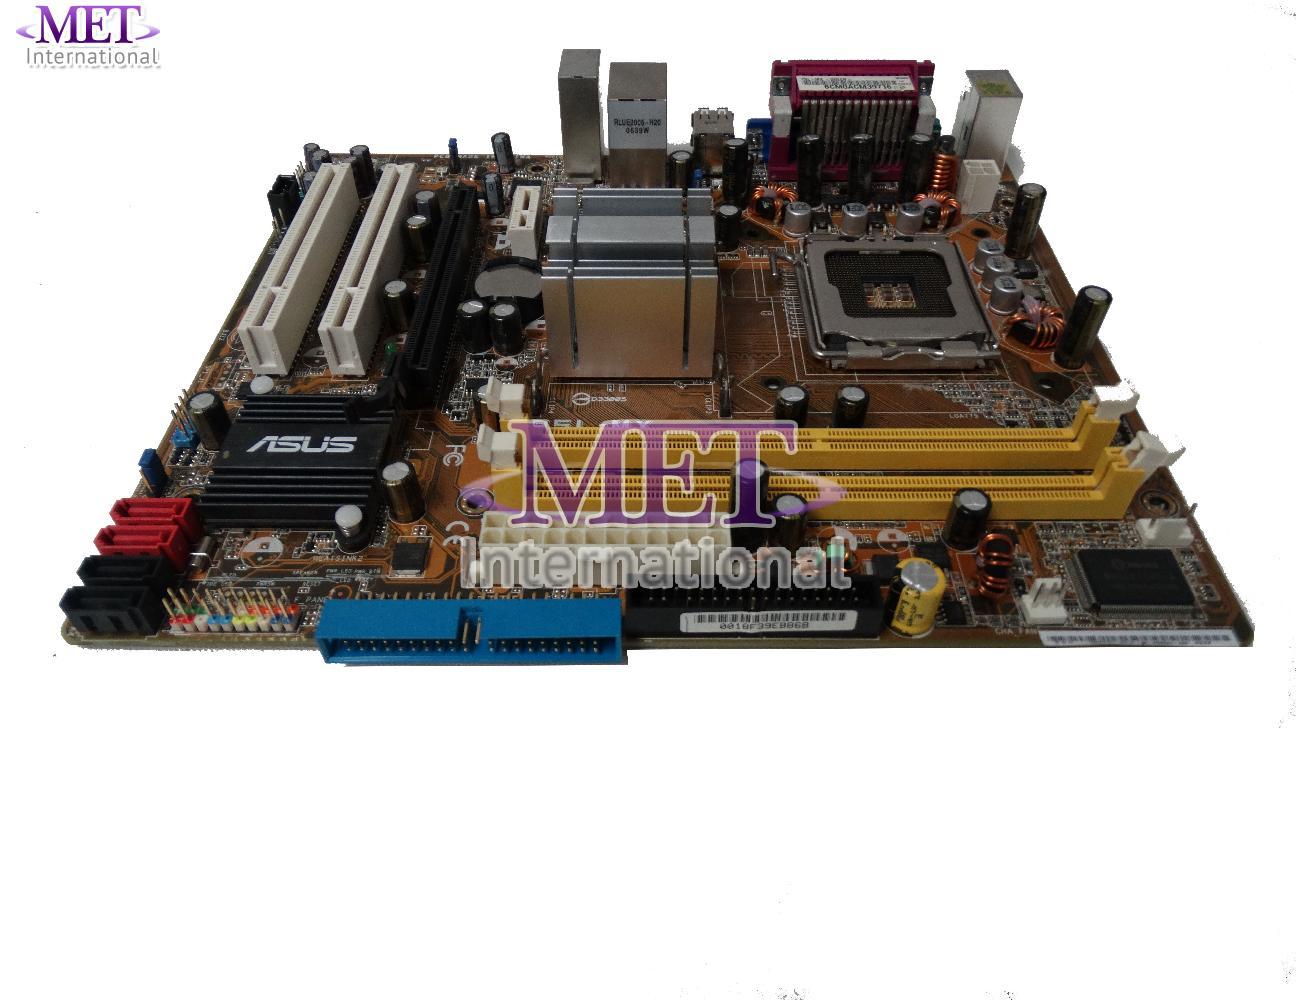 P5L-MX ASUS INTEL 945G CORE-2-DUO LGA775 MICRO ATX MOTHERBOARD